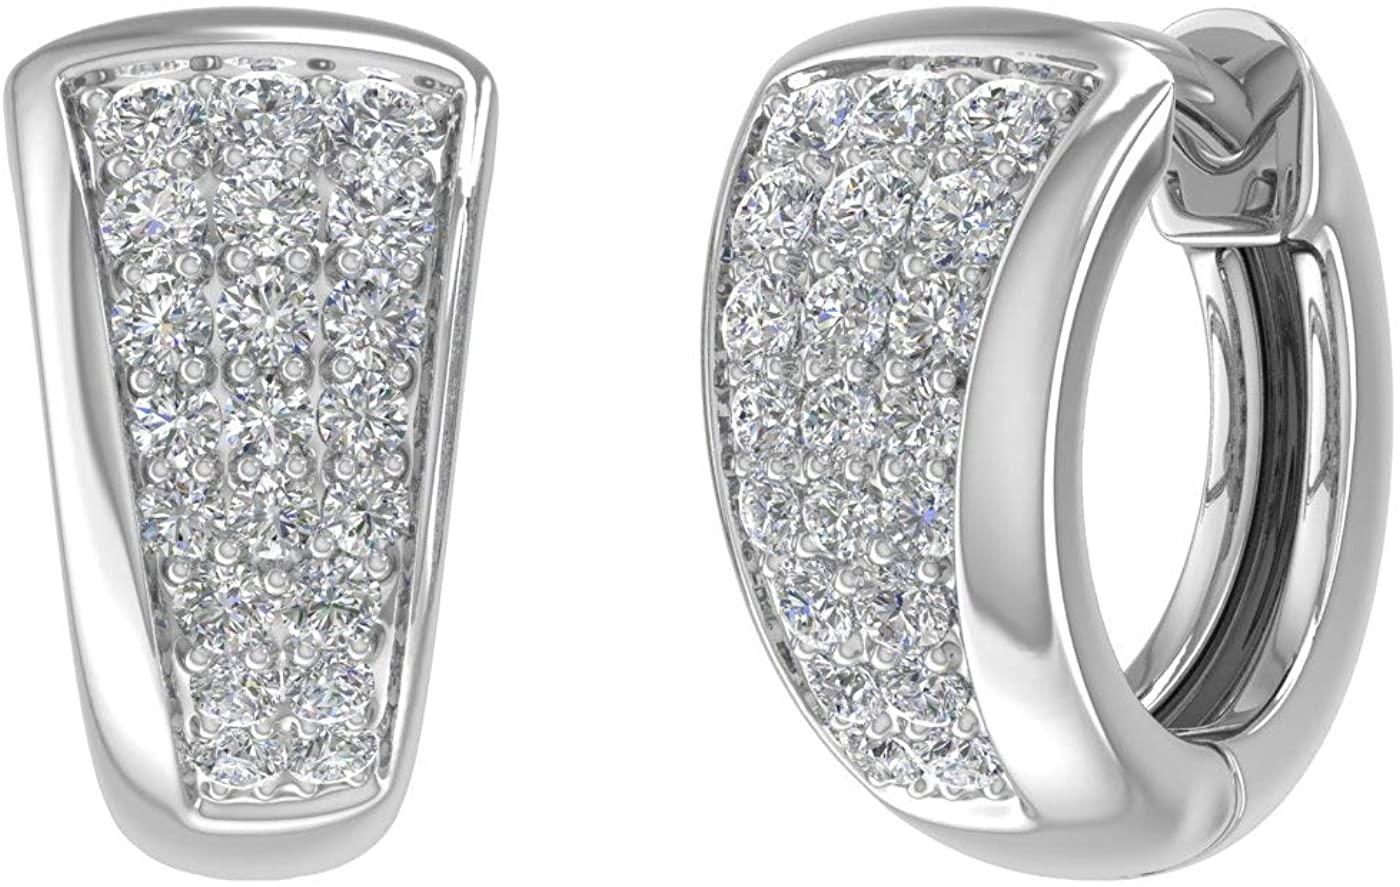 1/2 Carat Diamond Huggies Earrings in 14K Gold - IGI Certified